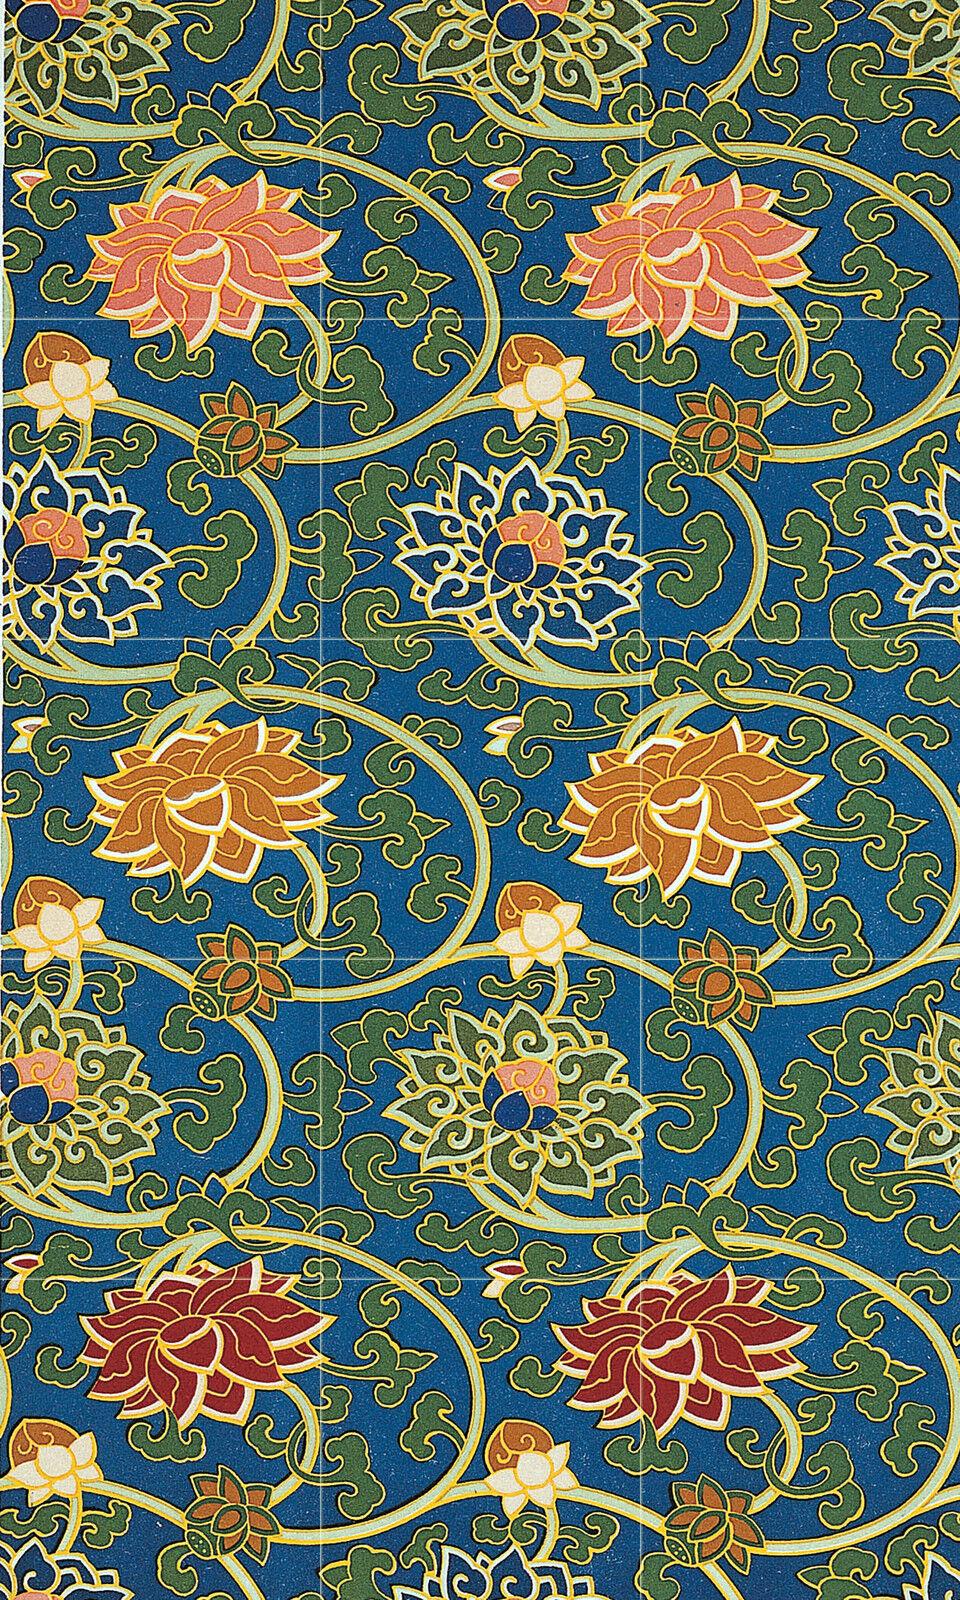 Art Oriental Flowers Ornament Kitchen Mural Ceramic Tiles Home Decor Tile  2515